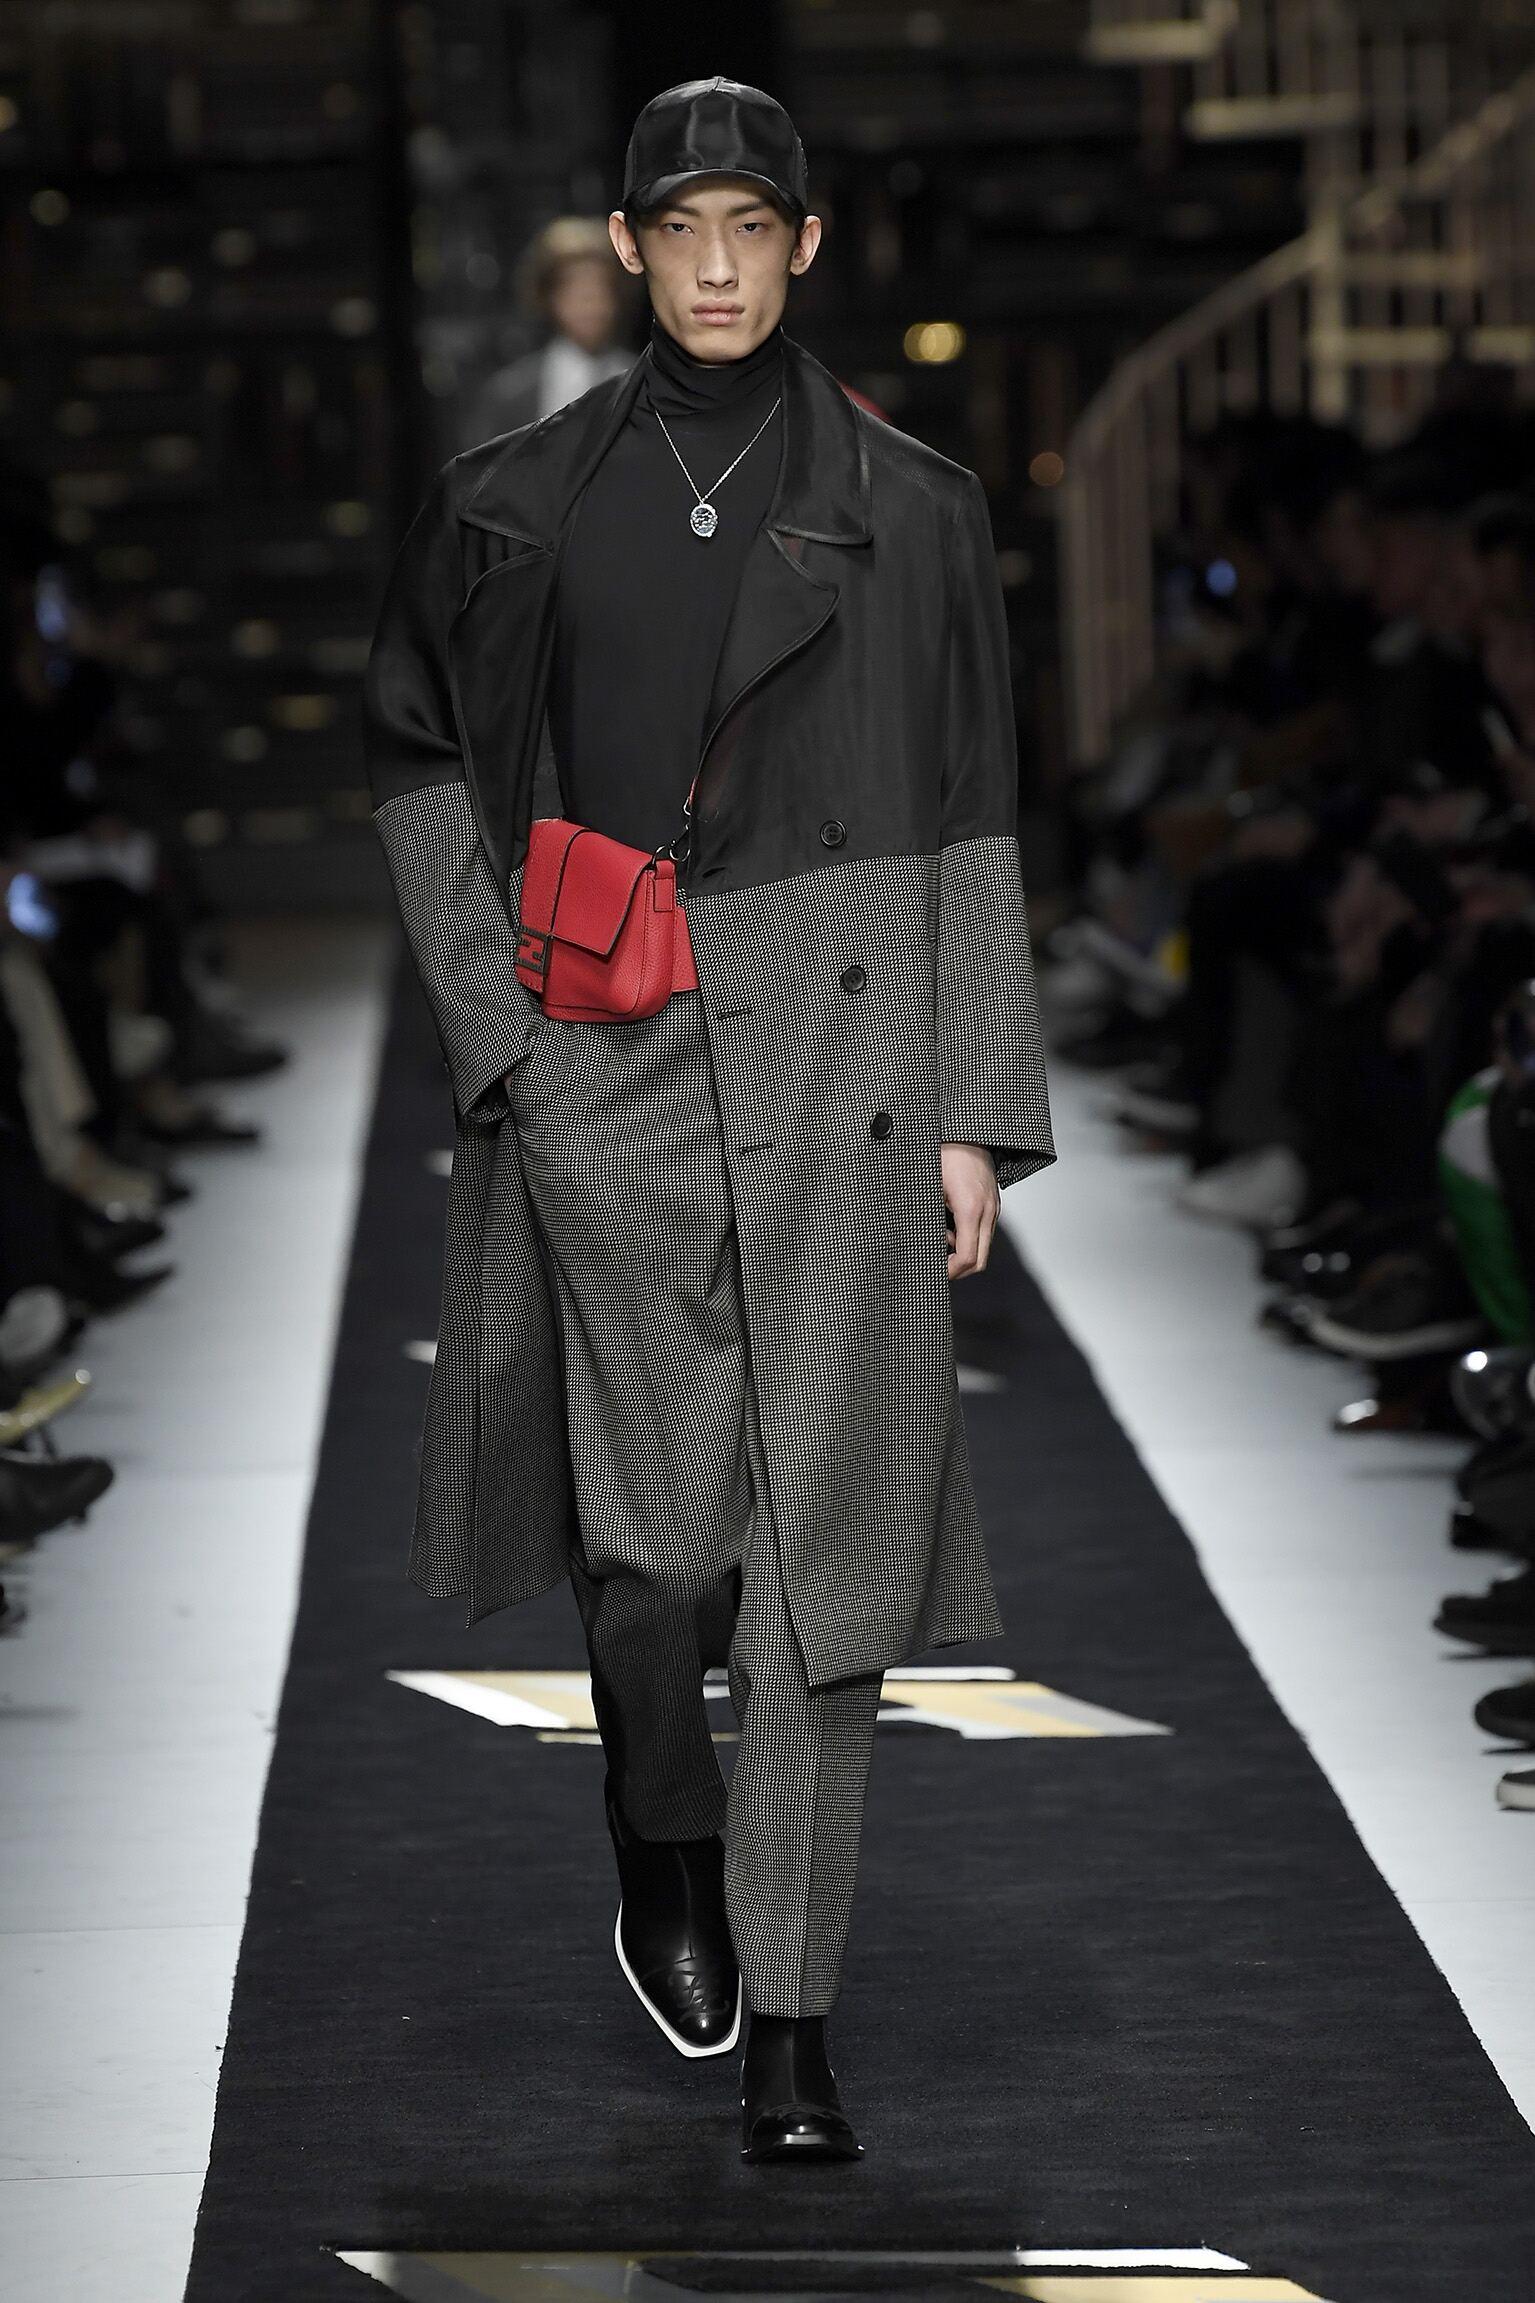 Catwalk Fendi Man Fashion Show Winter 2019